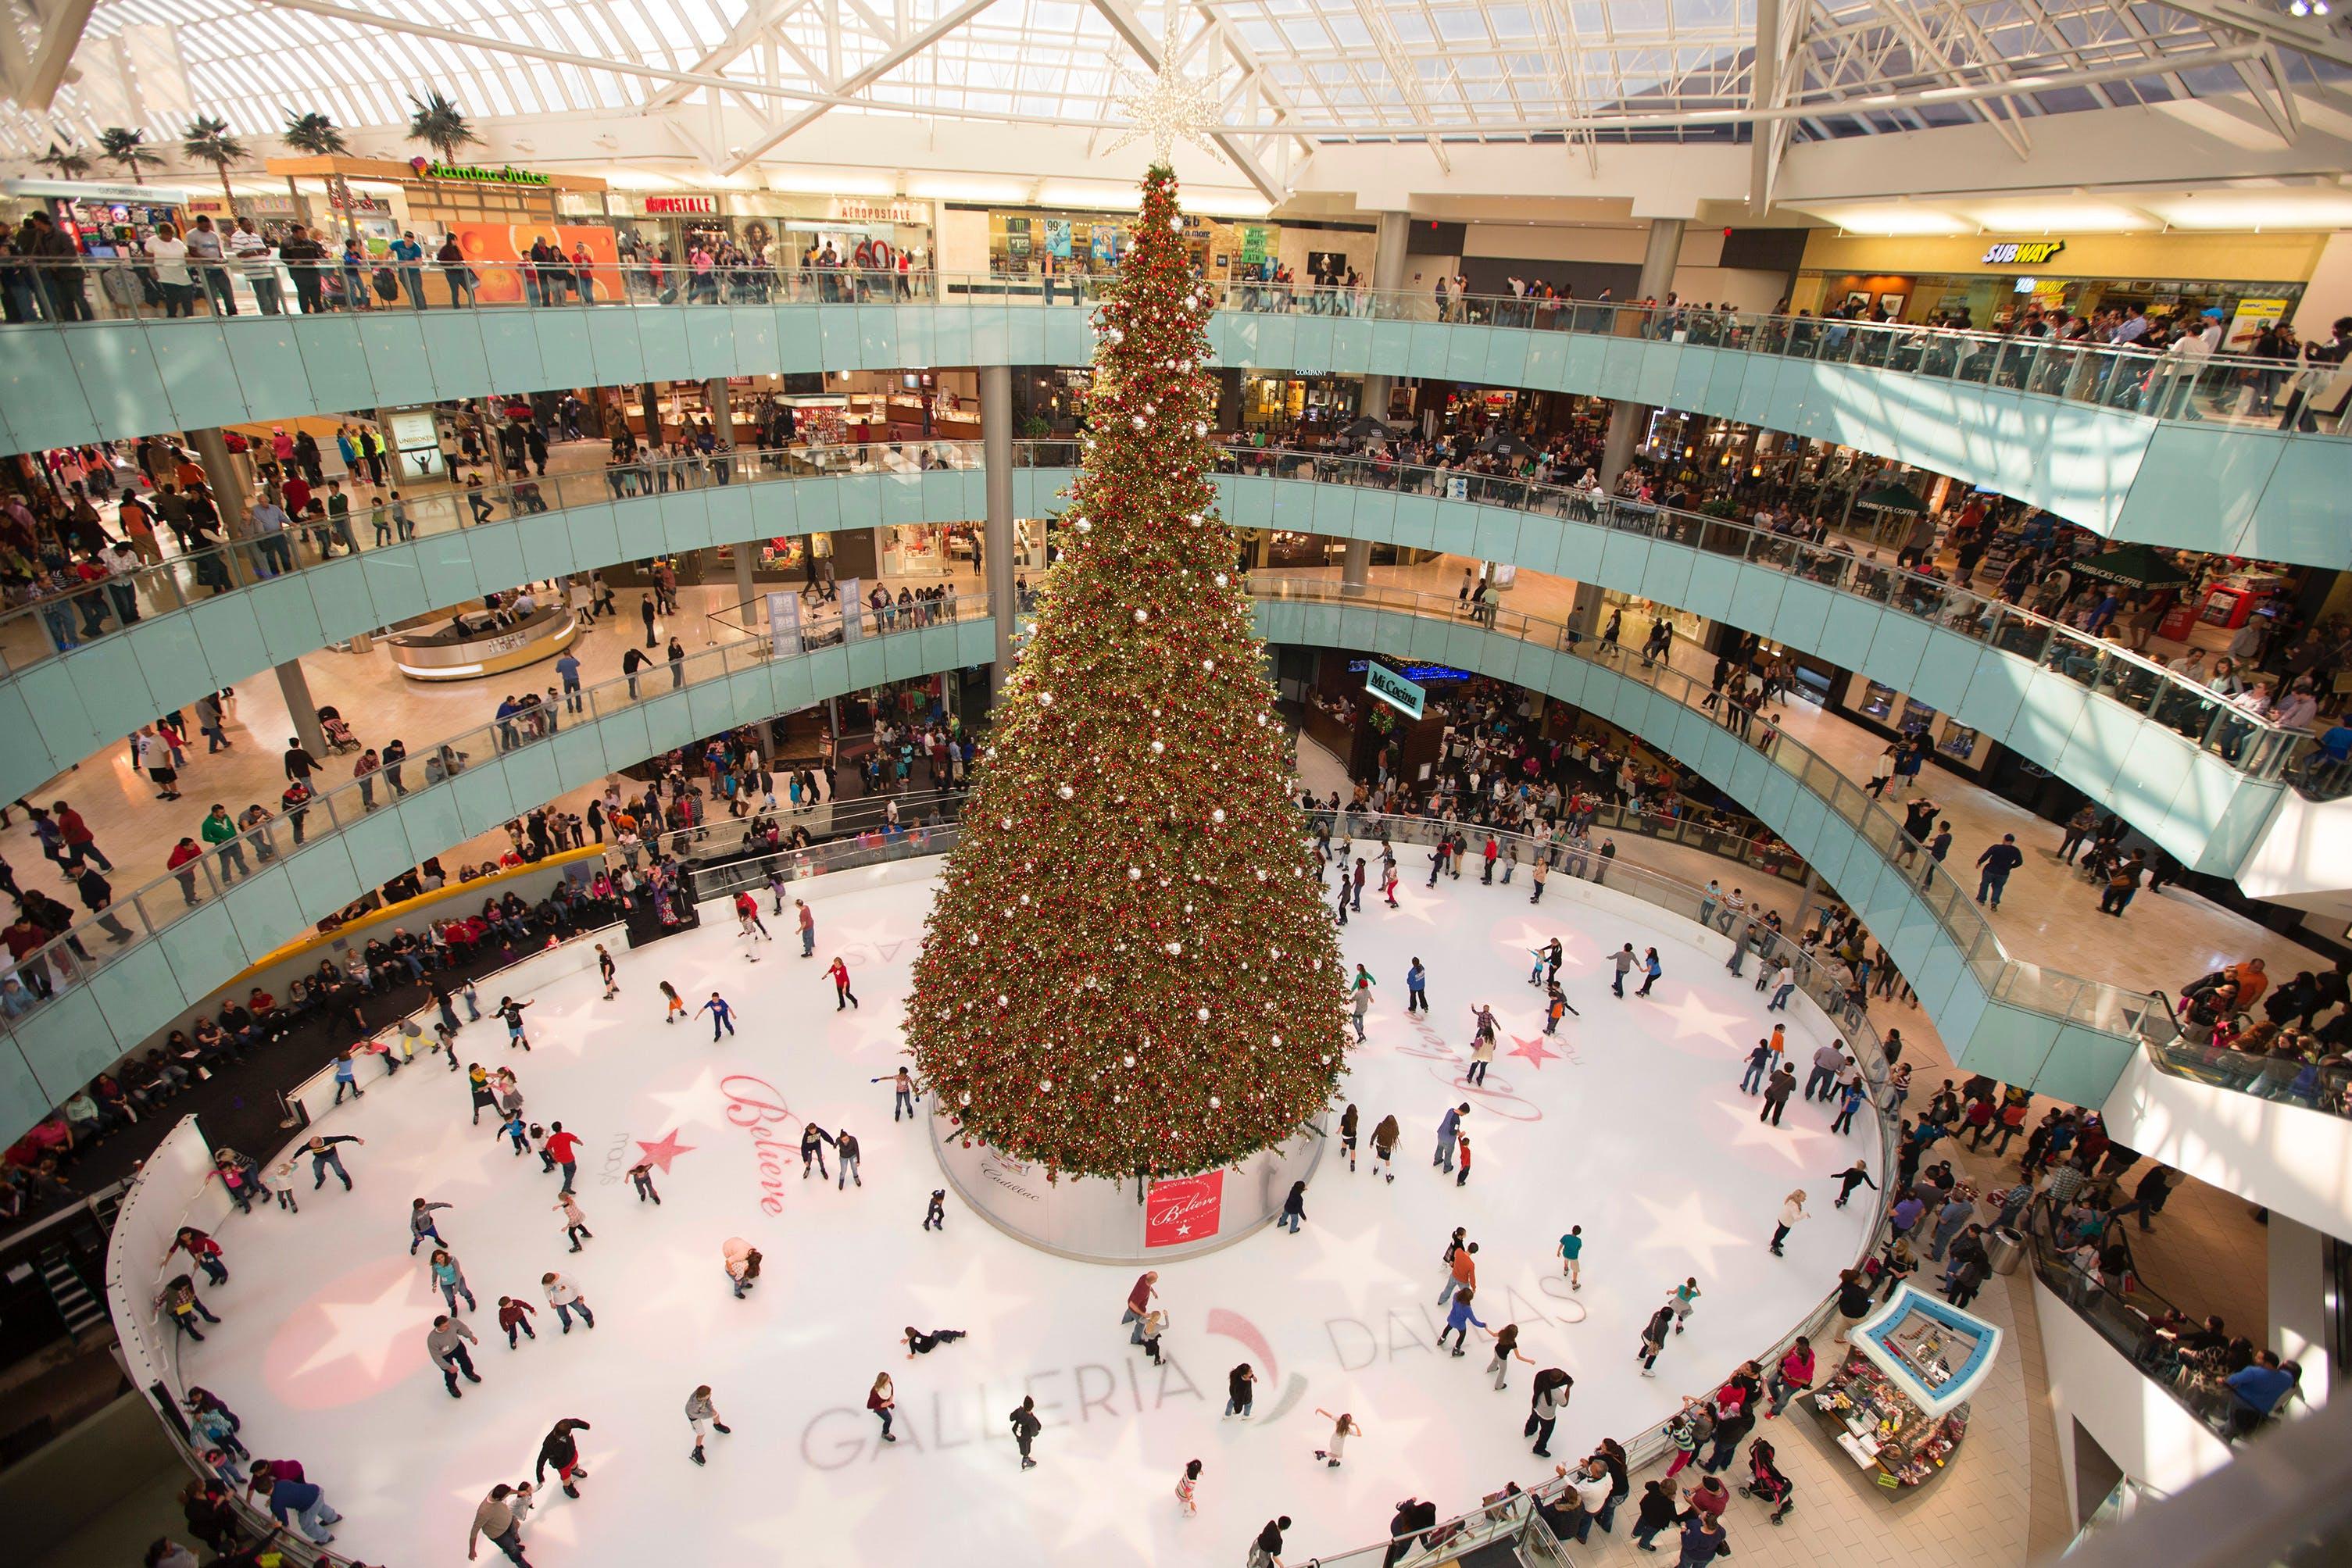 galleria ice skating dallas holiday guide